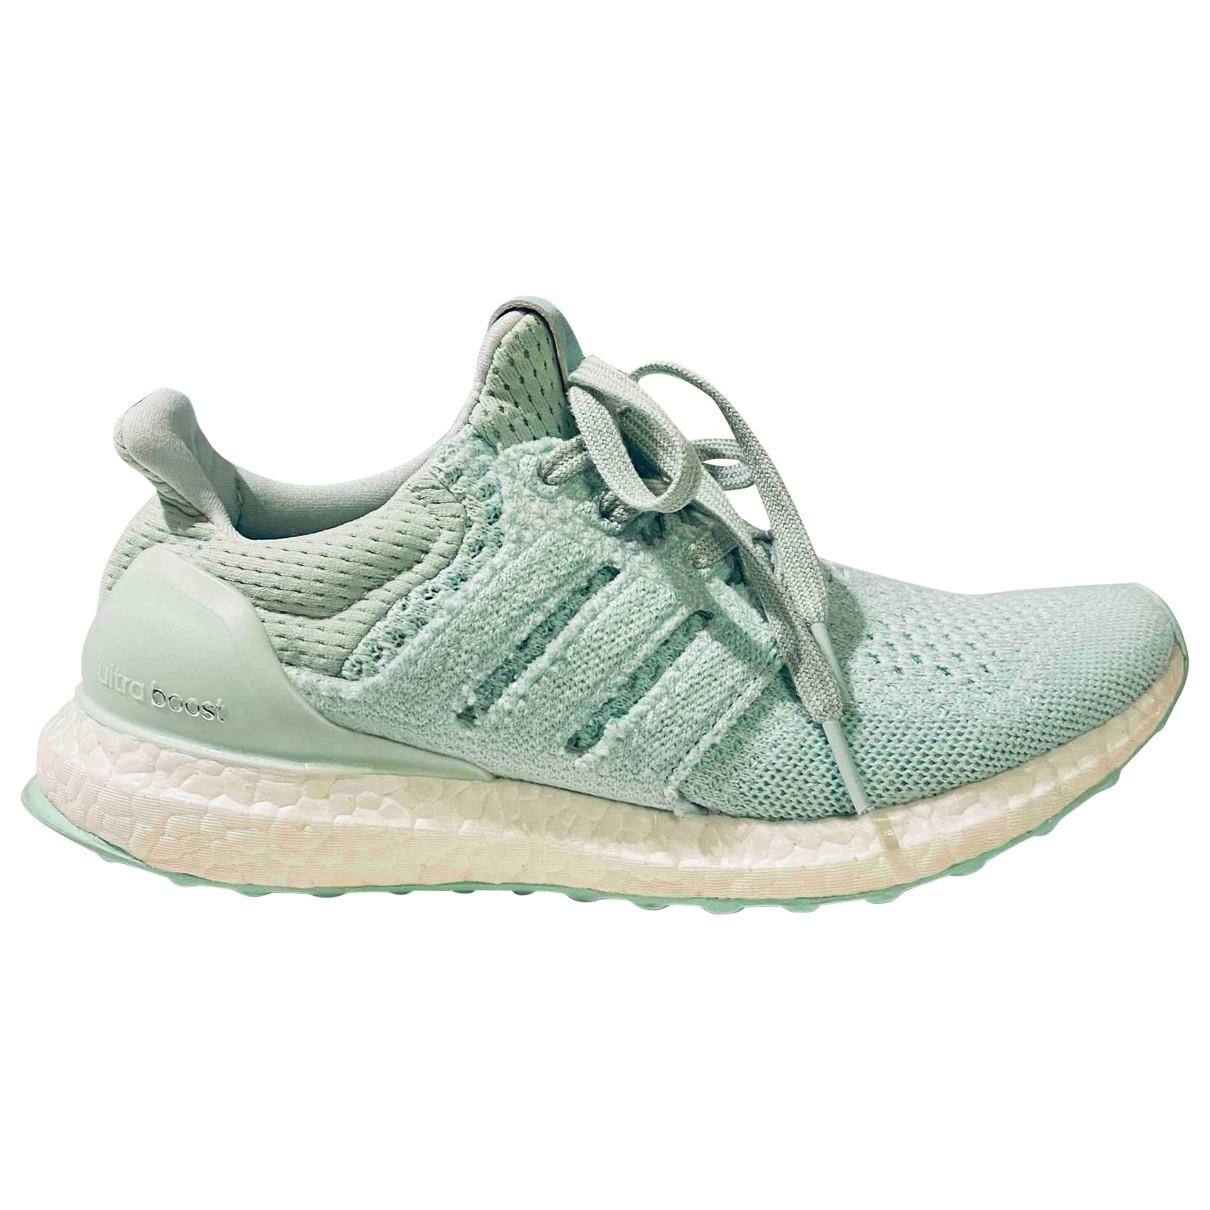 Adidas - Baskets Ultraboost pour femme en toile - vert